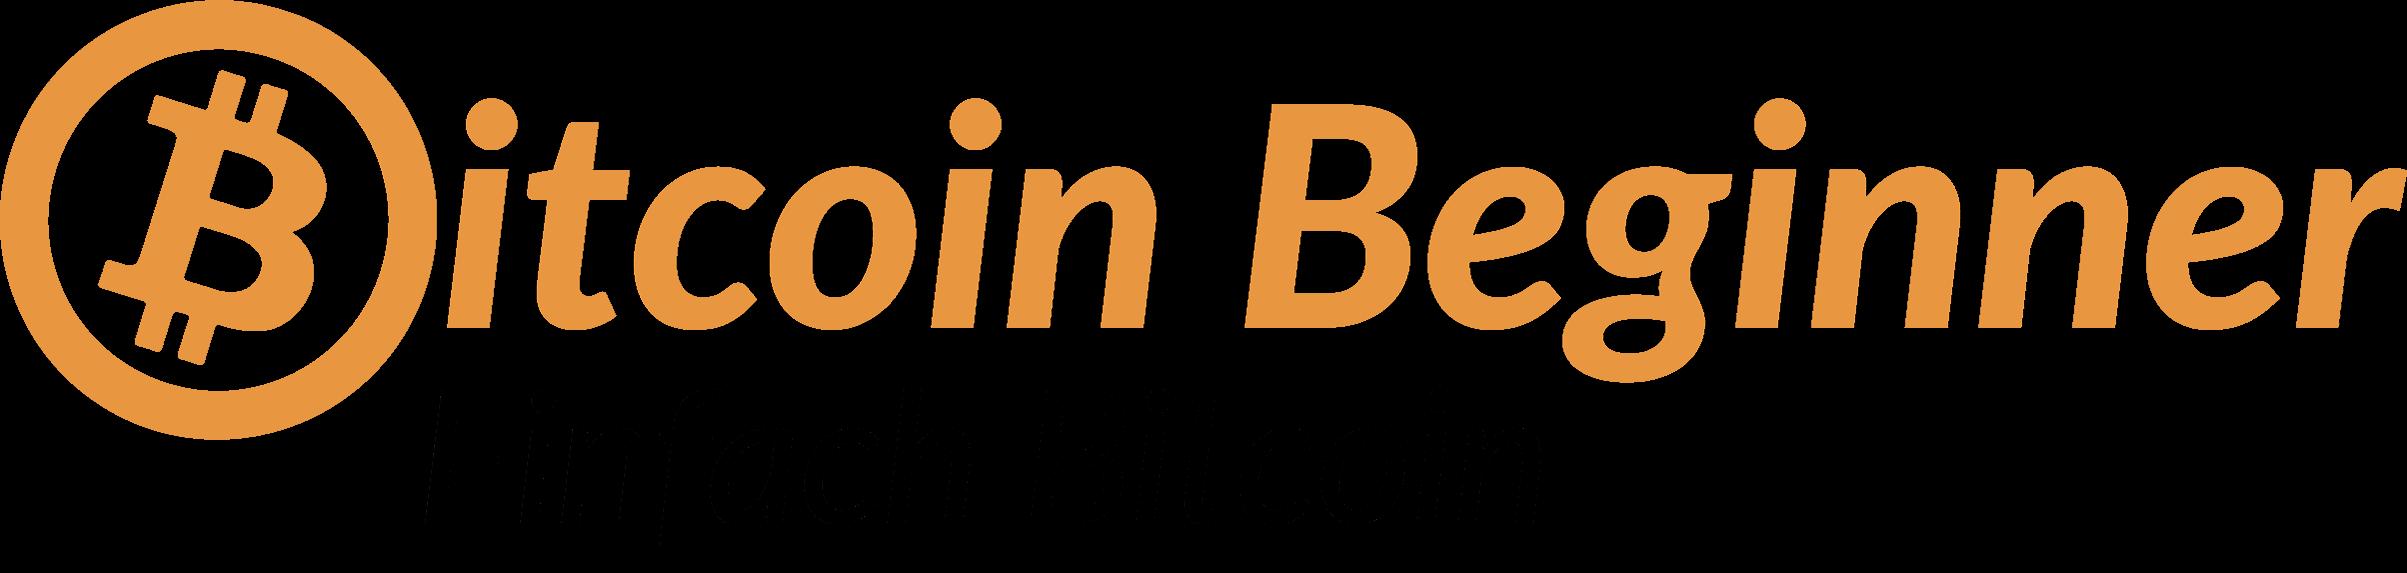 Bitcoin-Beginner.de